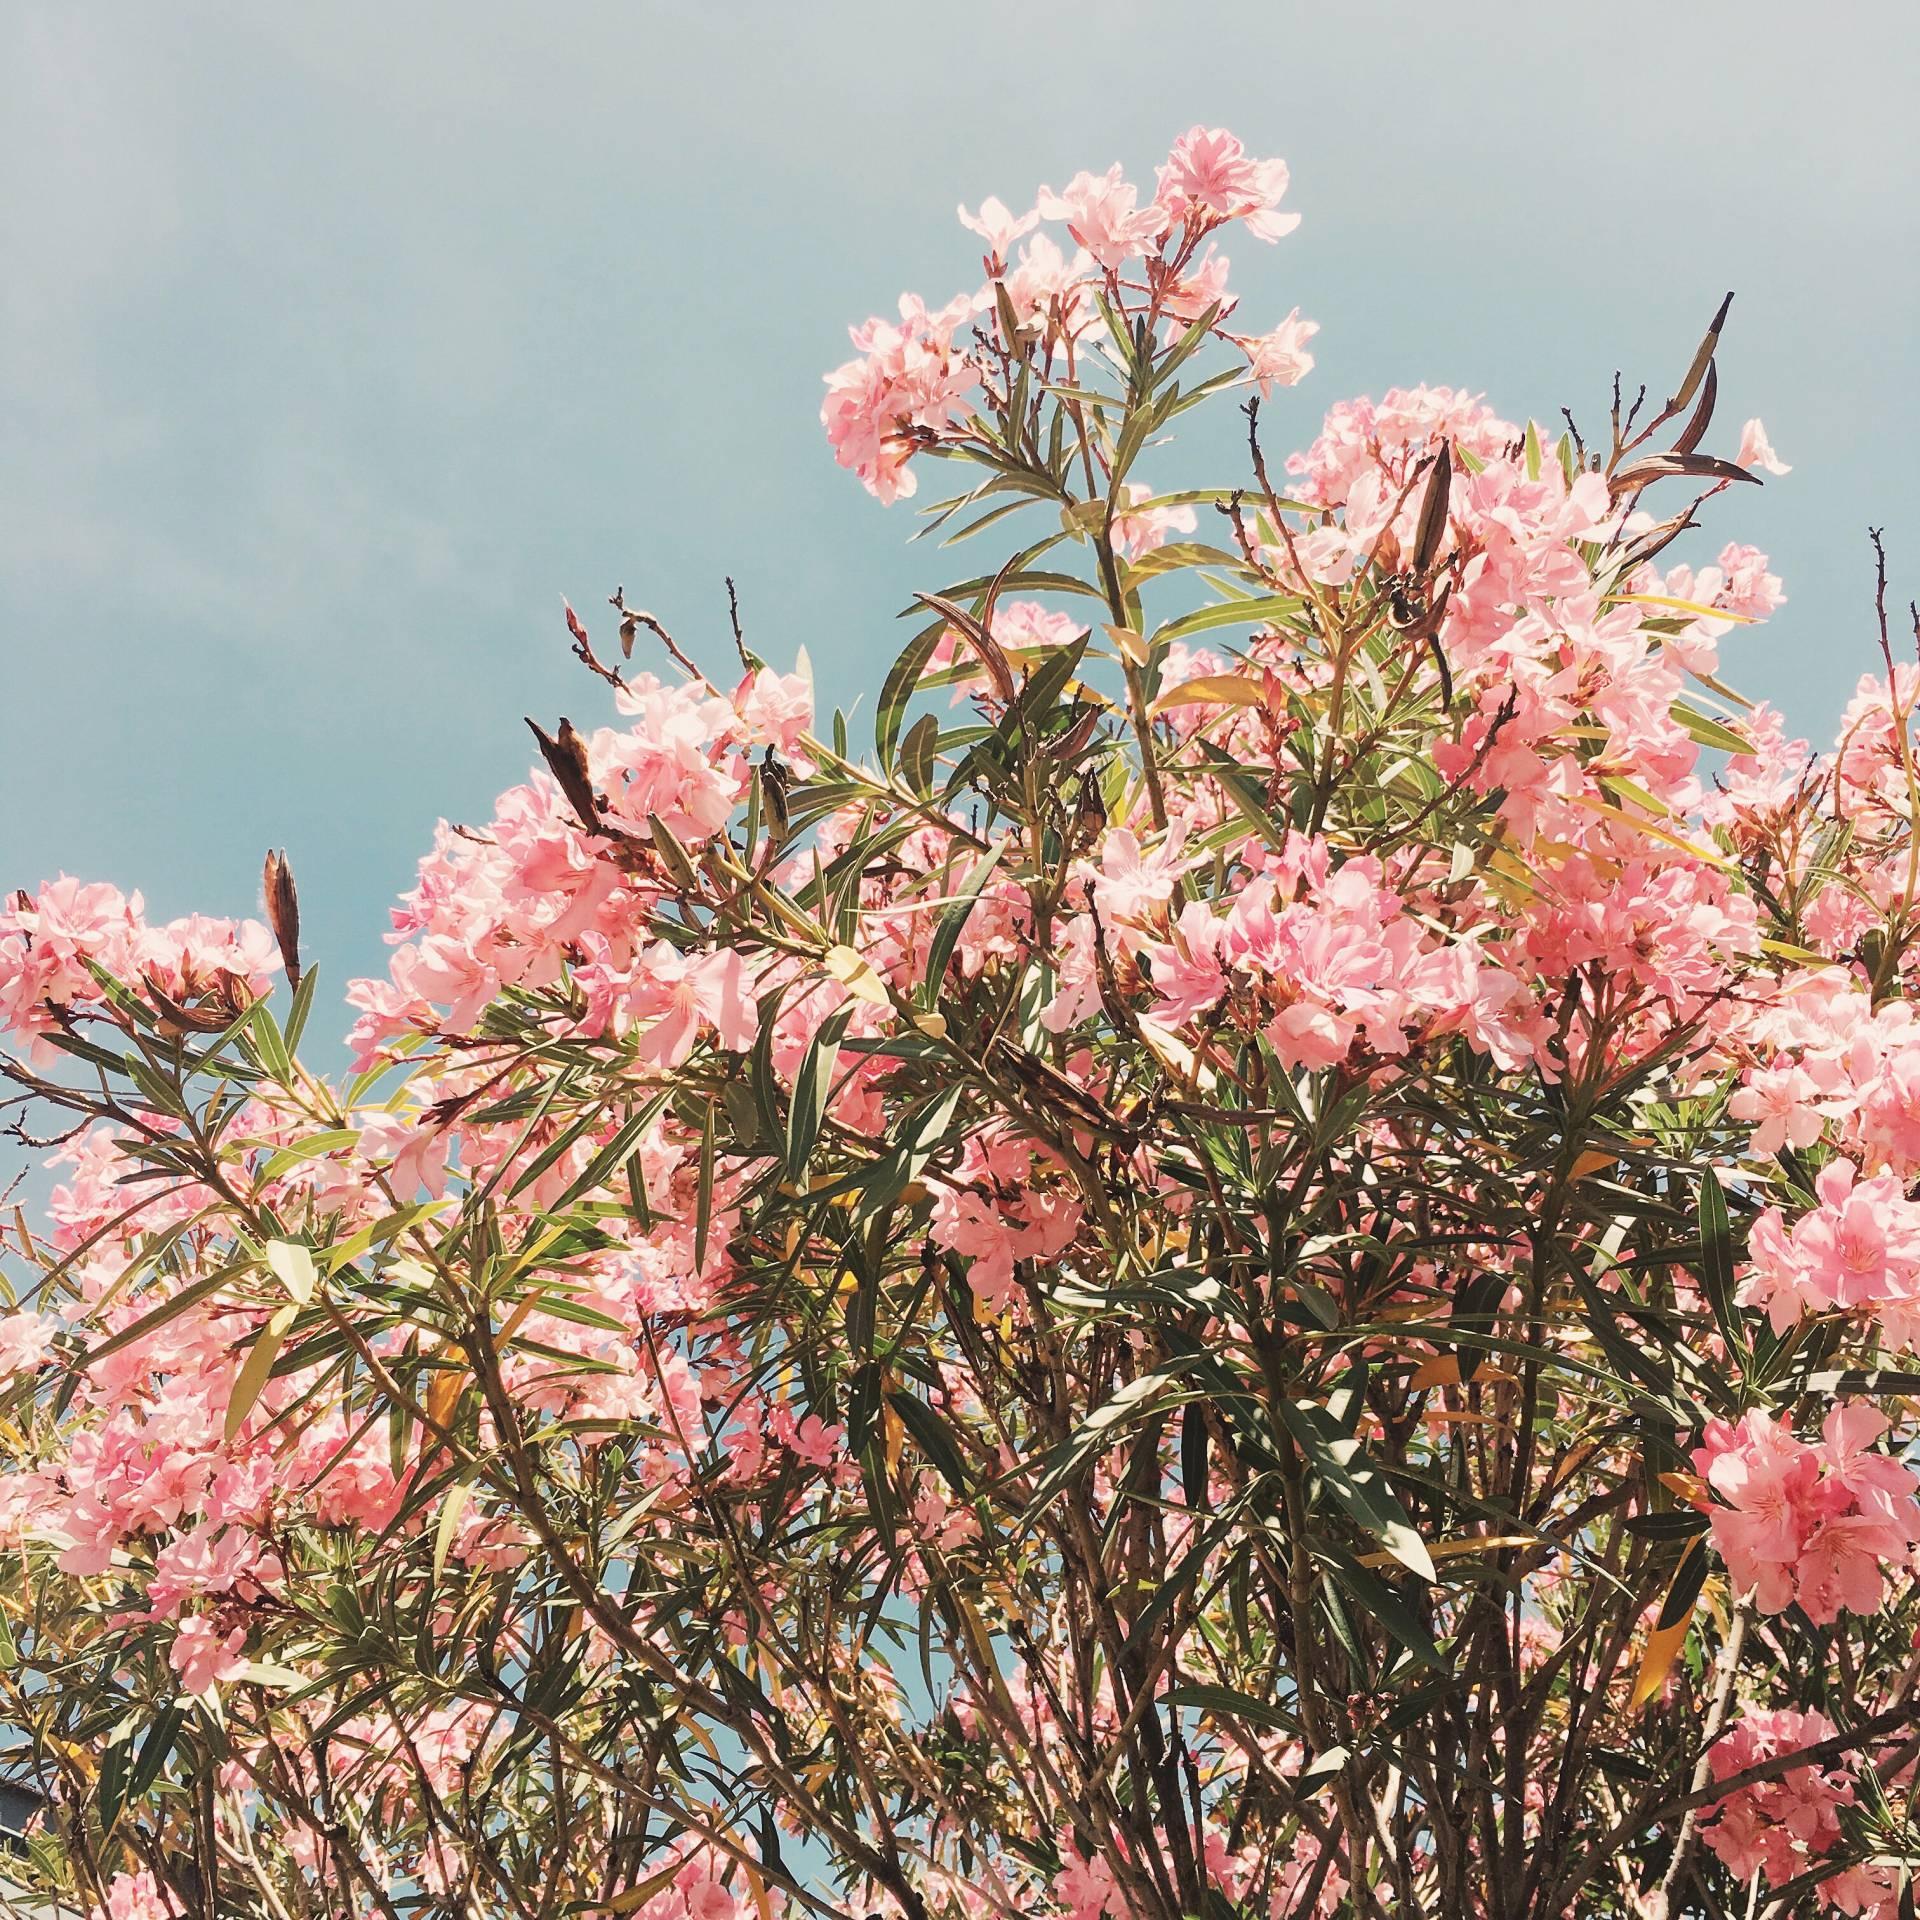 Pink Blooms in June